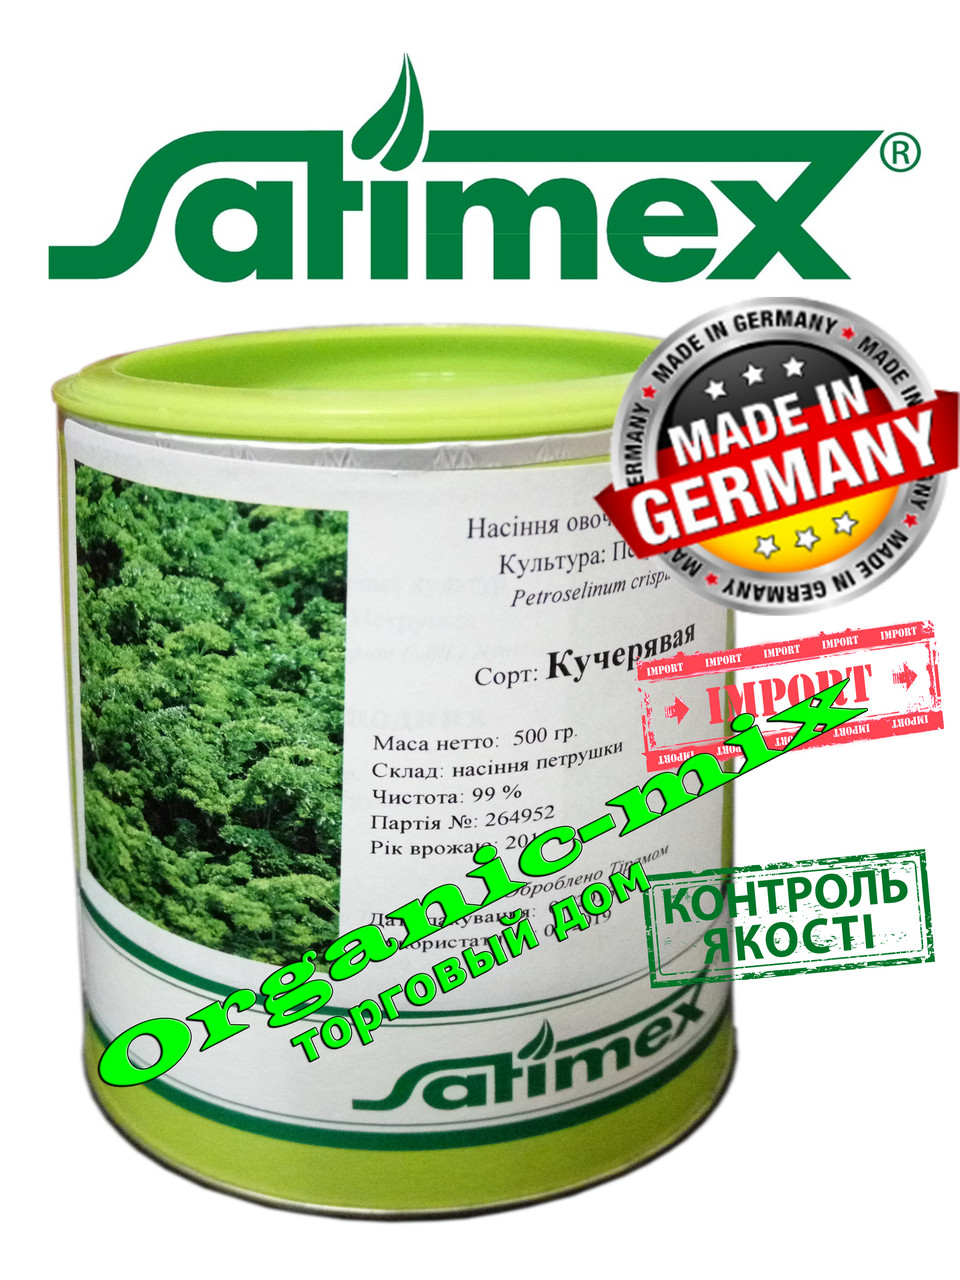 Петрушка кучерявая,  Германия Satimex, банка 500 грамм